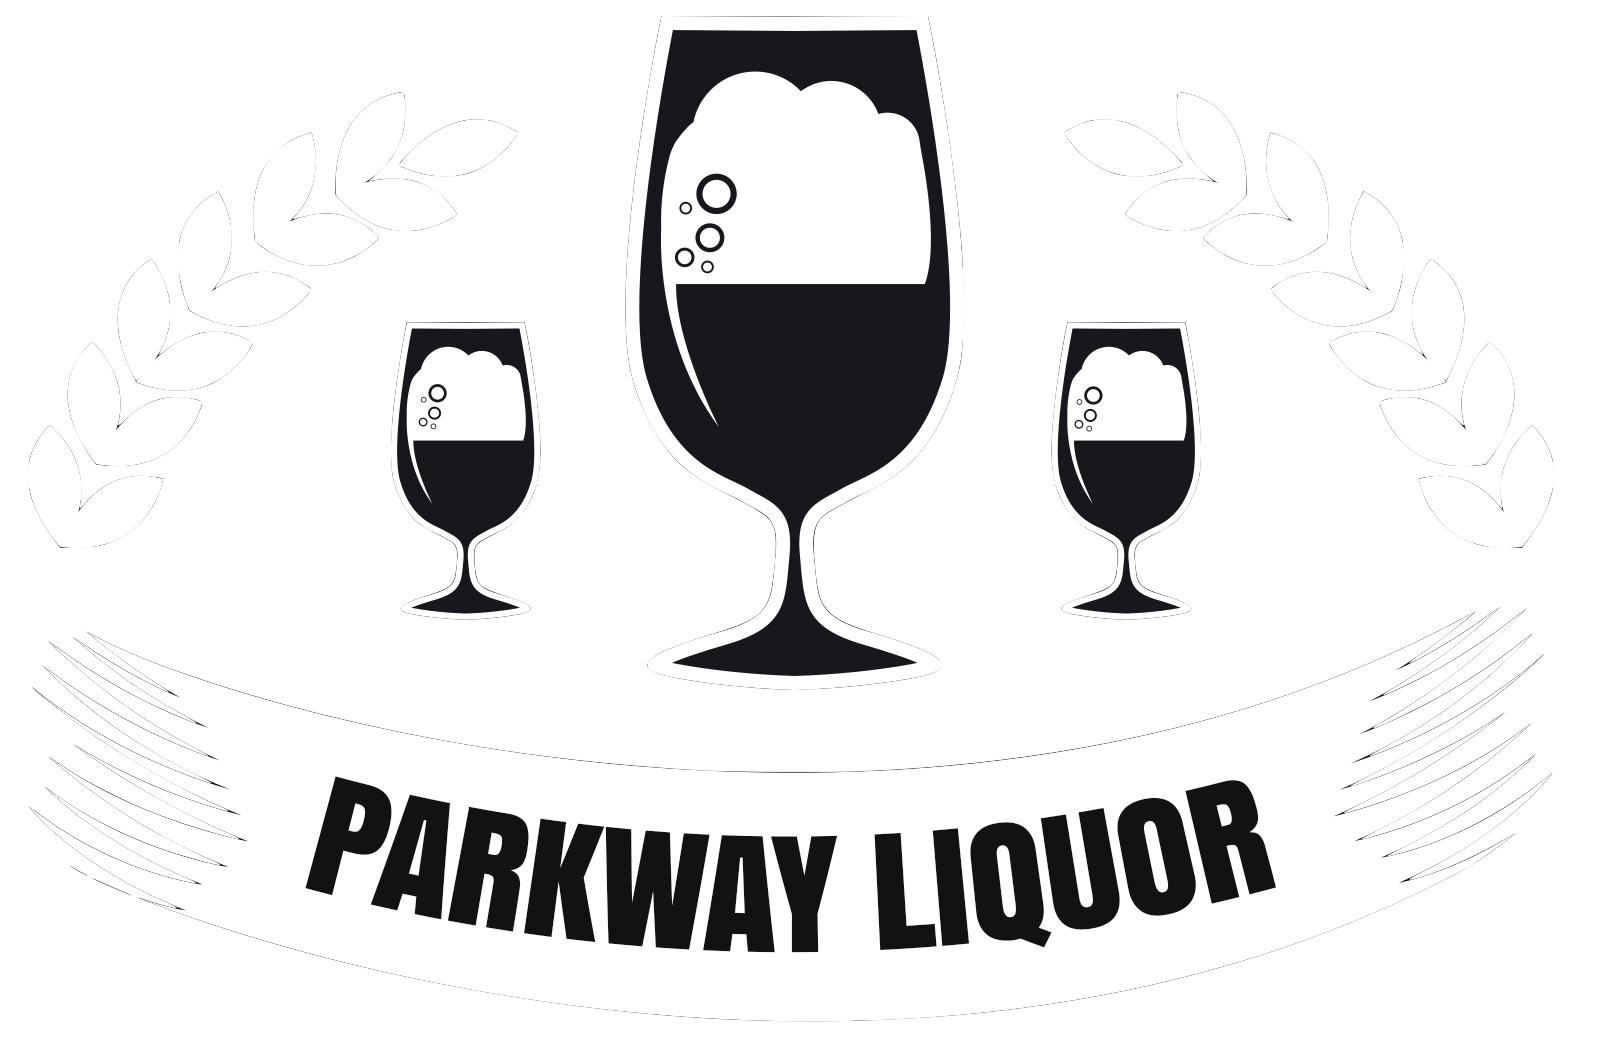 Parkway Liquor